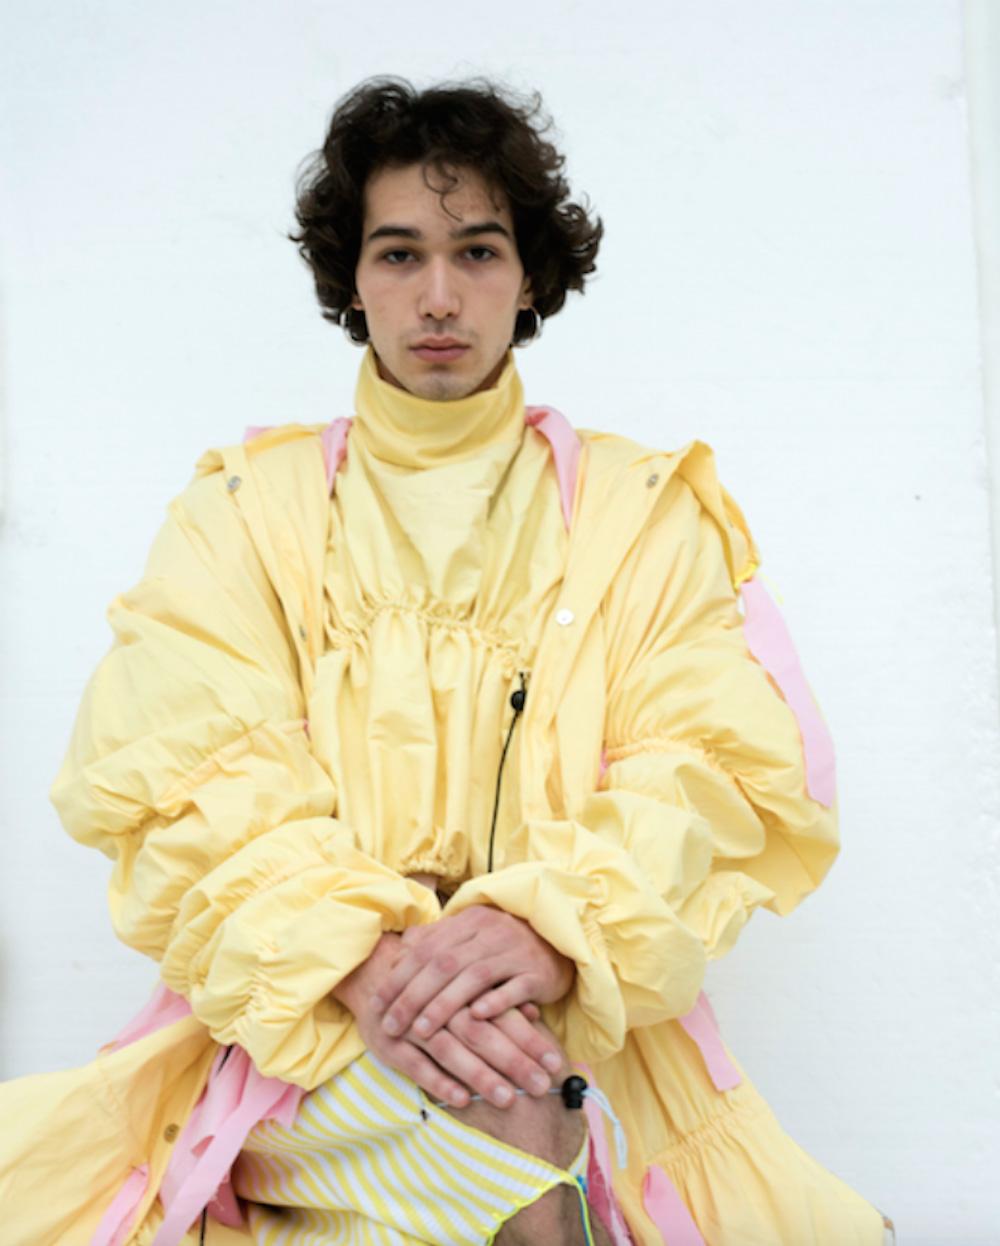 LCF BA17 work by BA (Hons) Fashion Photography graduate Federica Mungo.